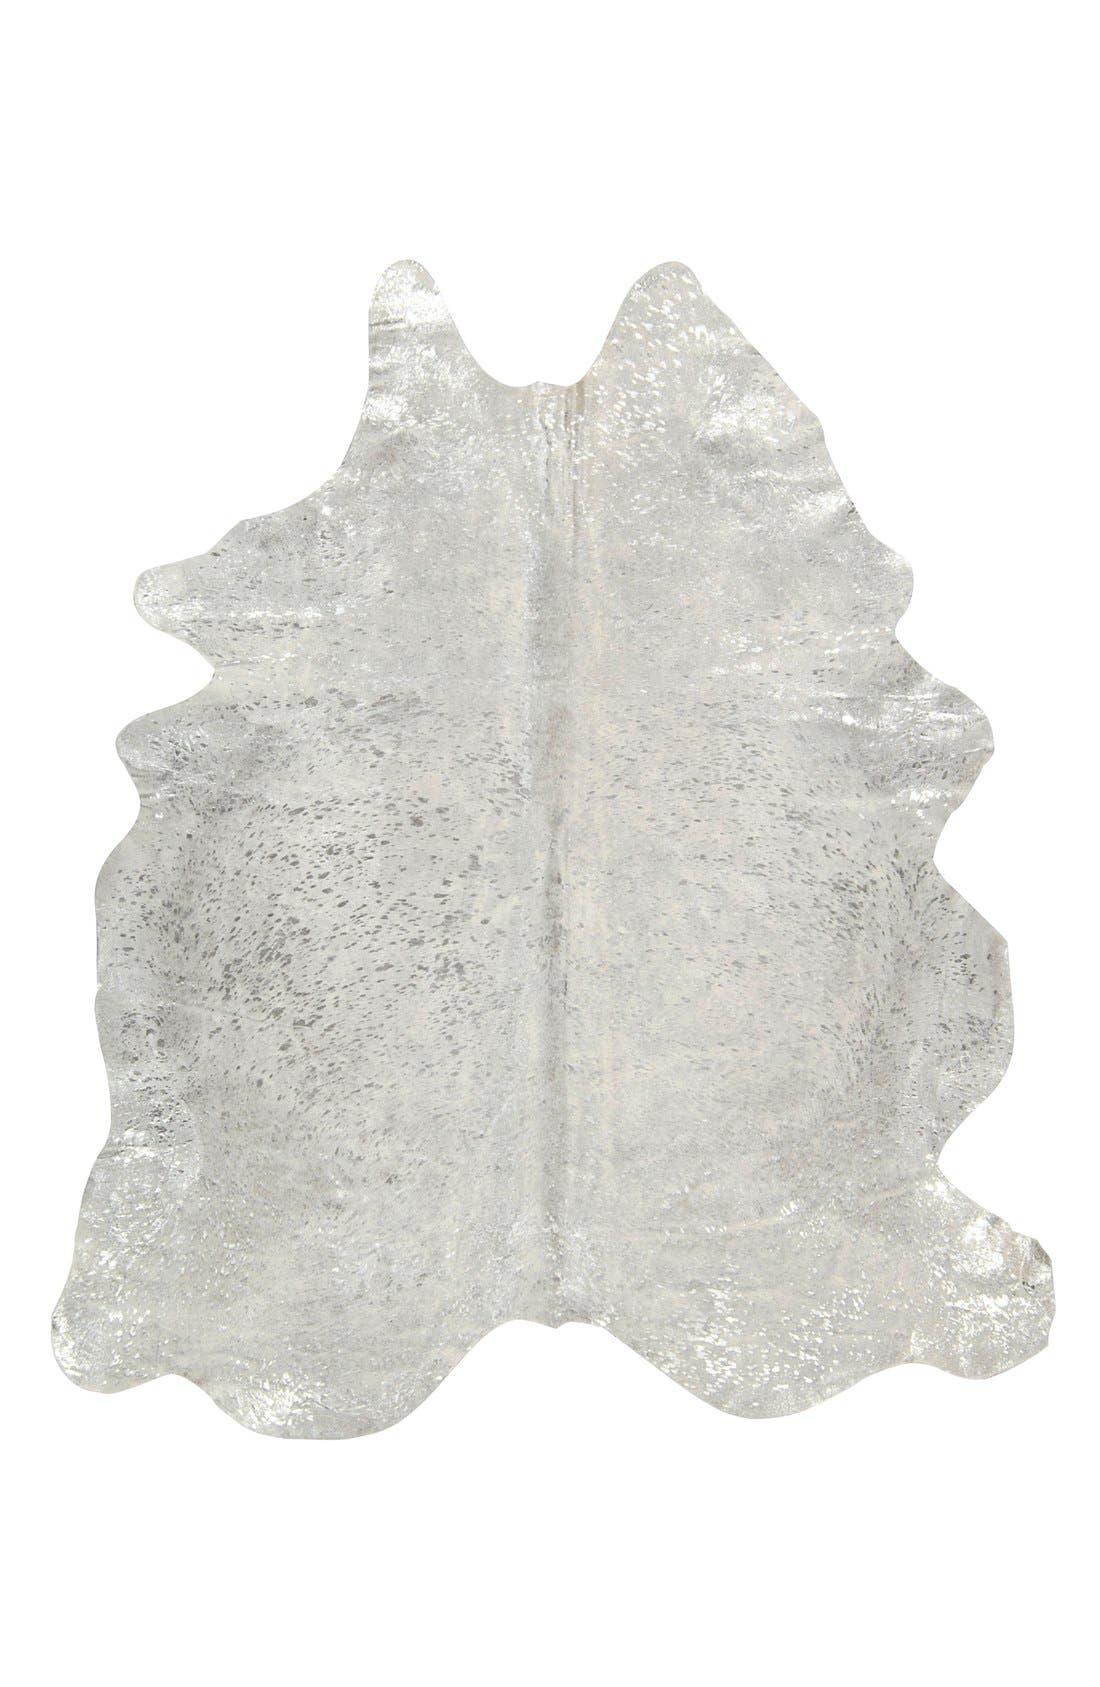 Main Image - Mina Victory 'Metallic Splash' Genuine Cowhide Rug